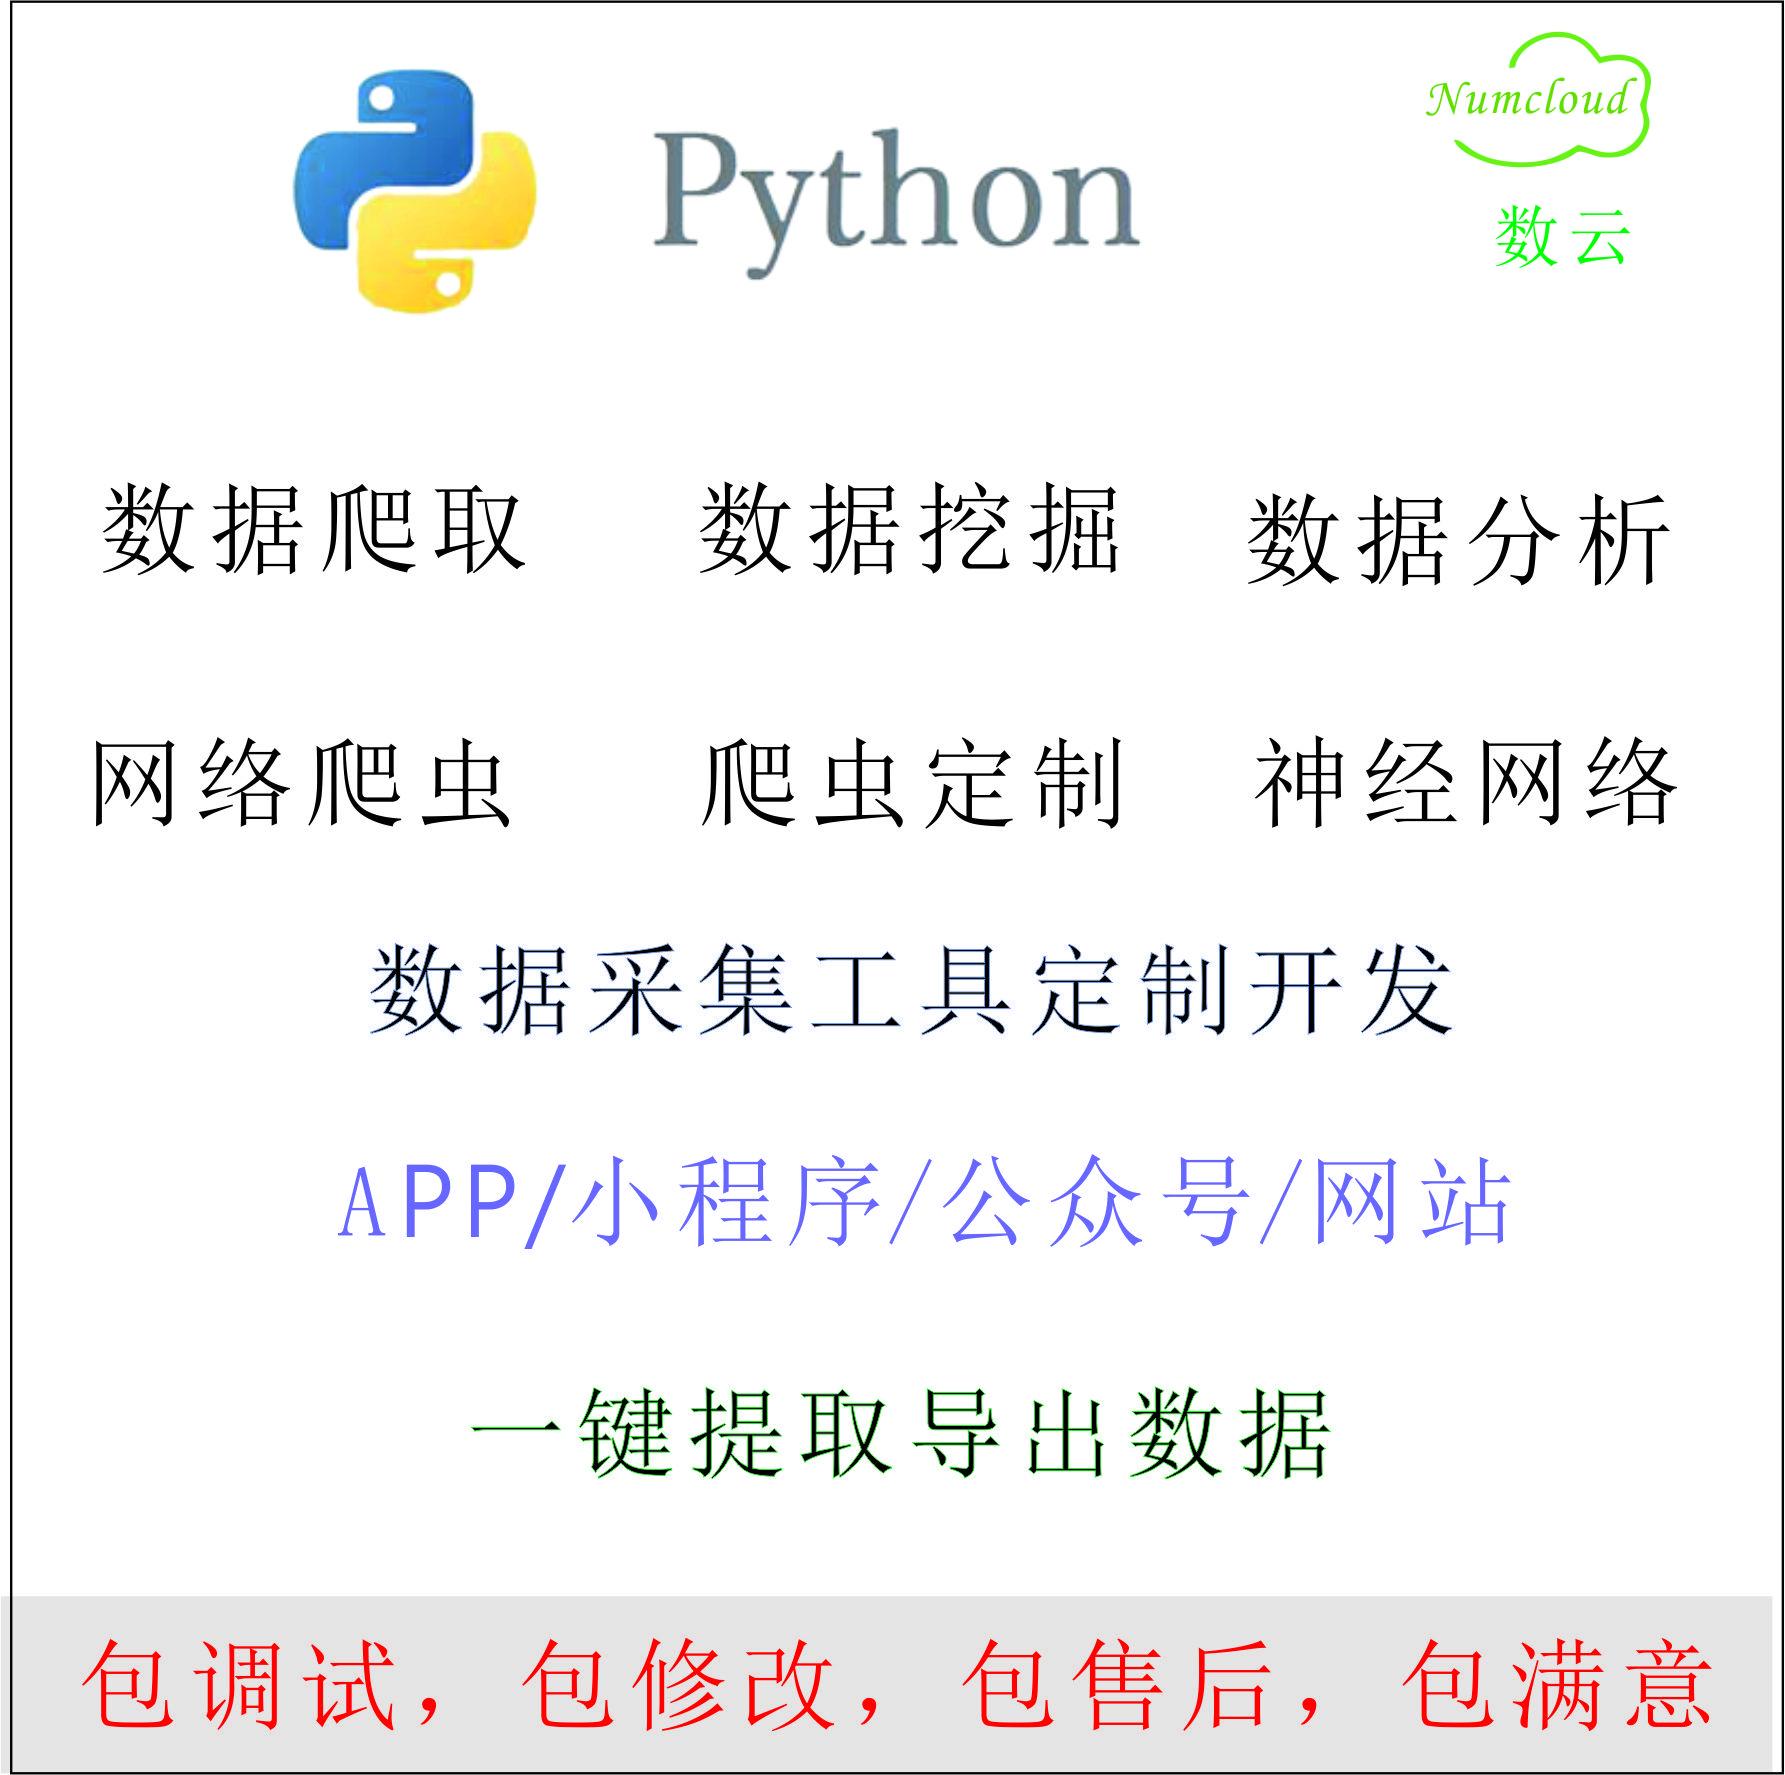 app小程序网页数据抓取提取采集/网络爬虫软件定制/一键导出excel